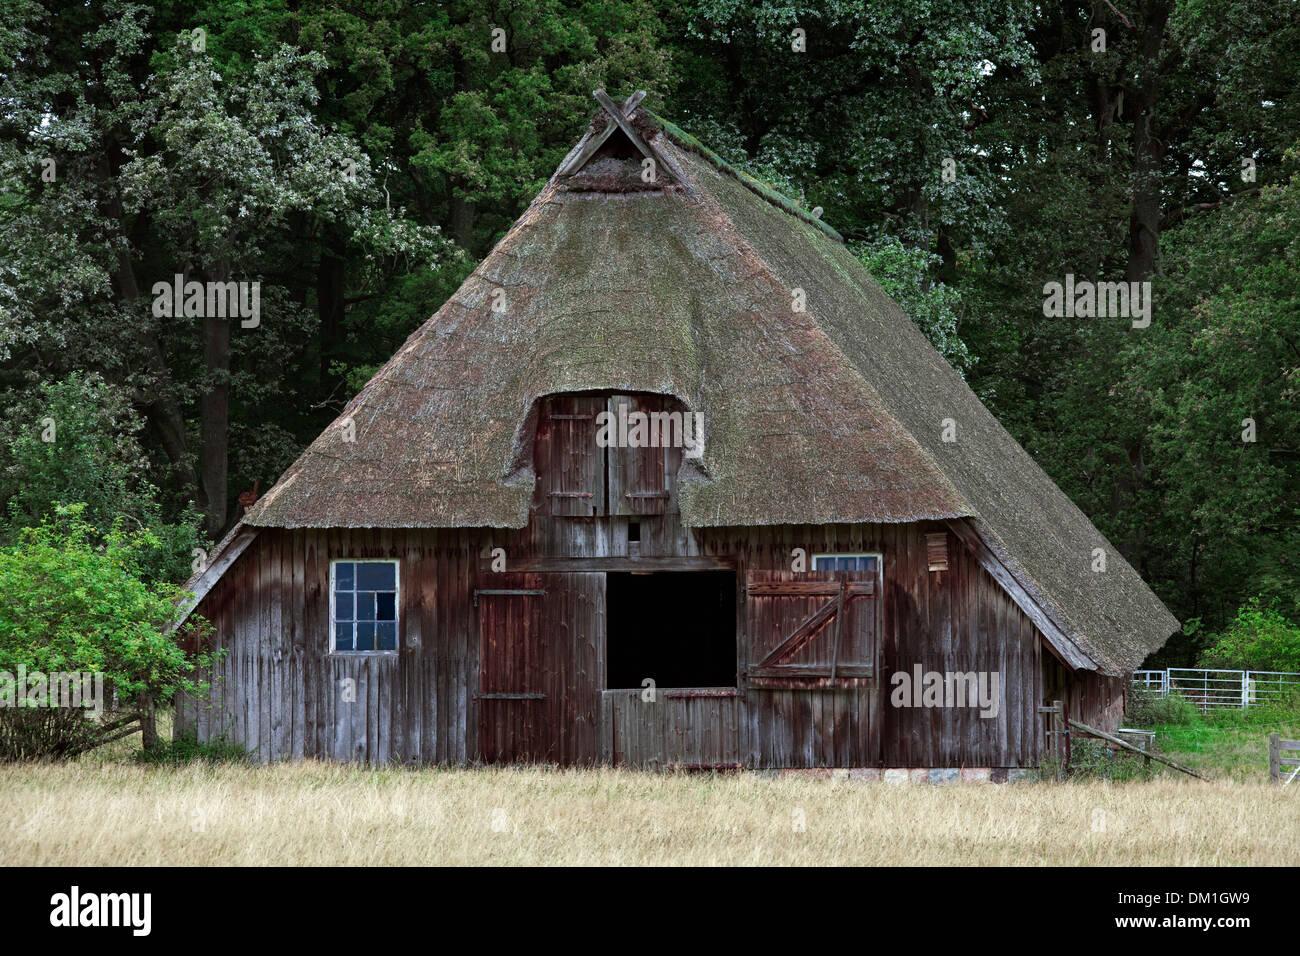 Traditional sheepfold / sheep cote at the Lüneburg Heath / Lunenburg Heathland, Lower Saxony, Germany - Stock Image